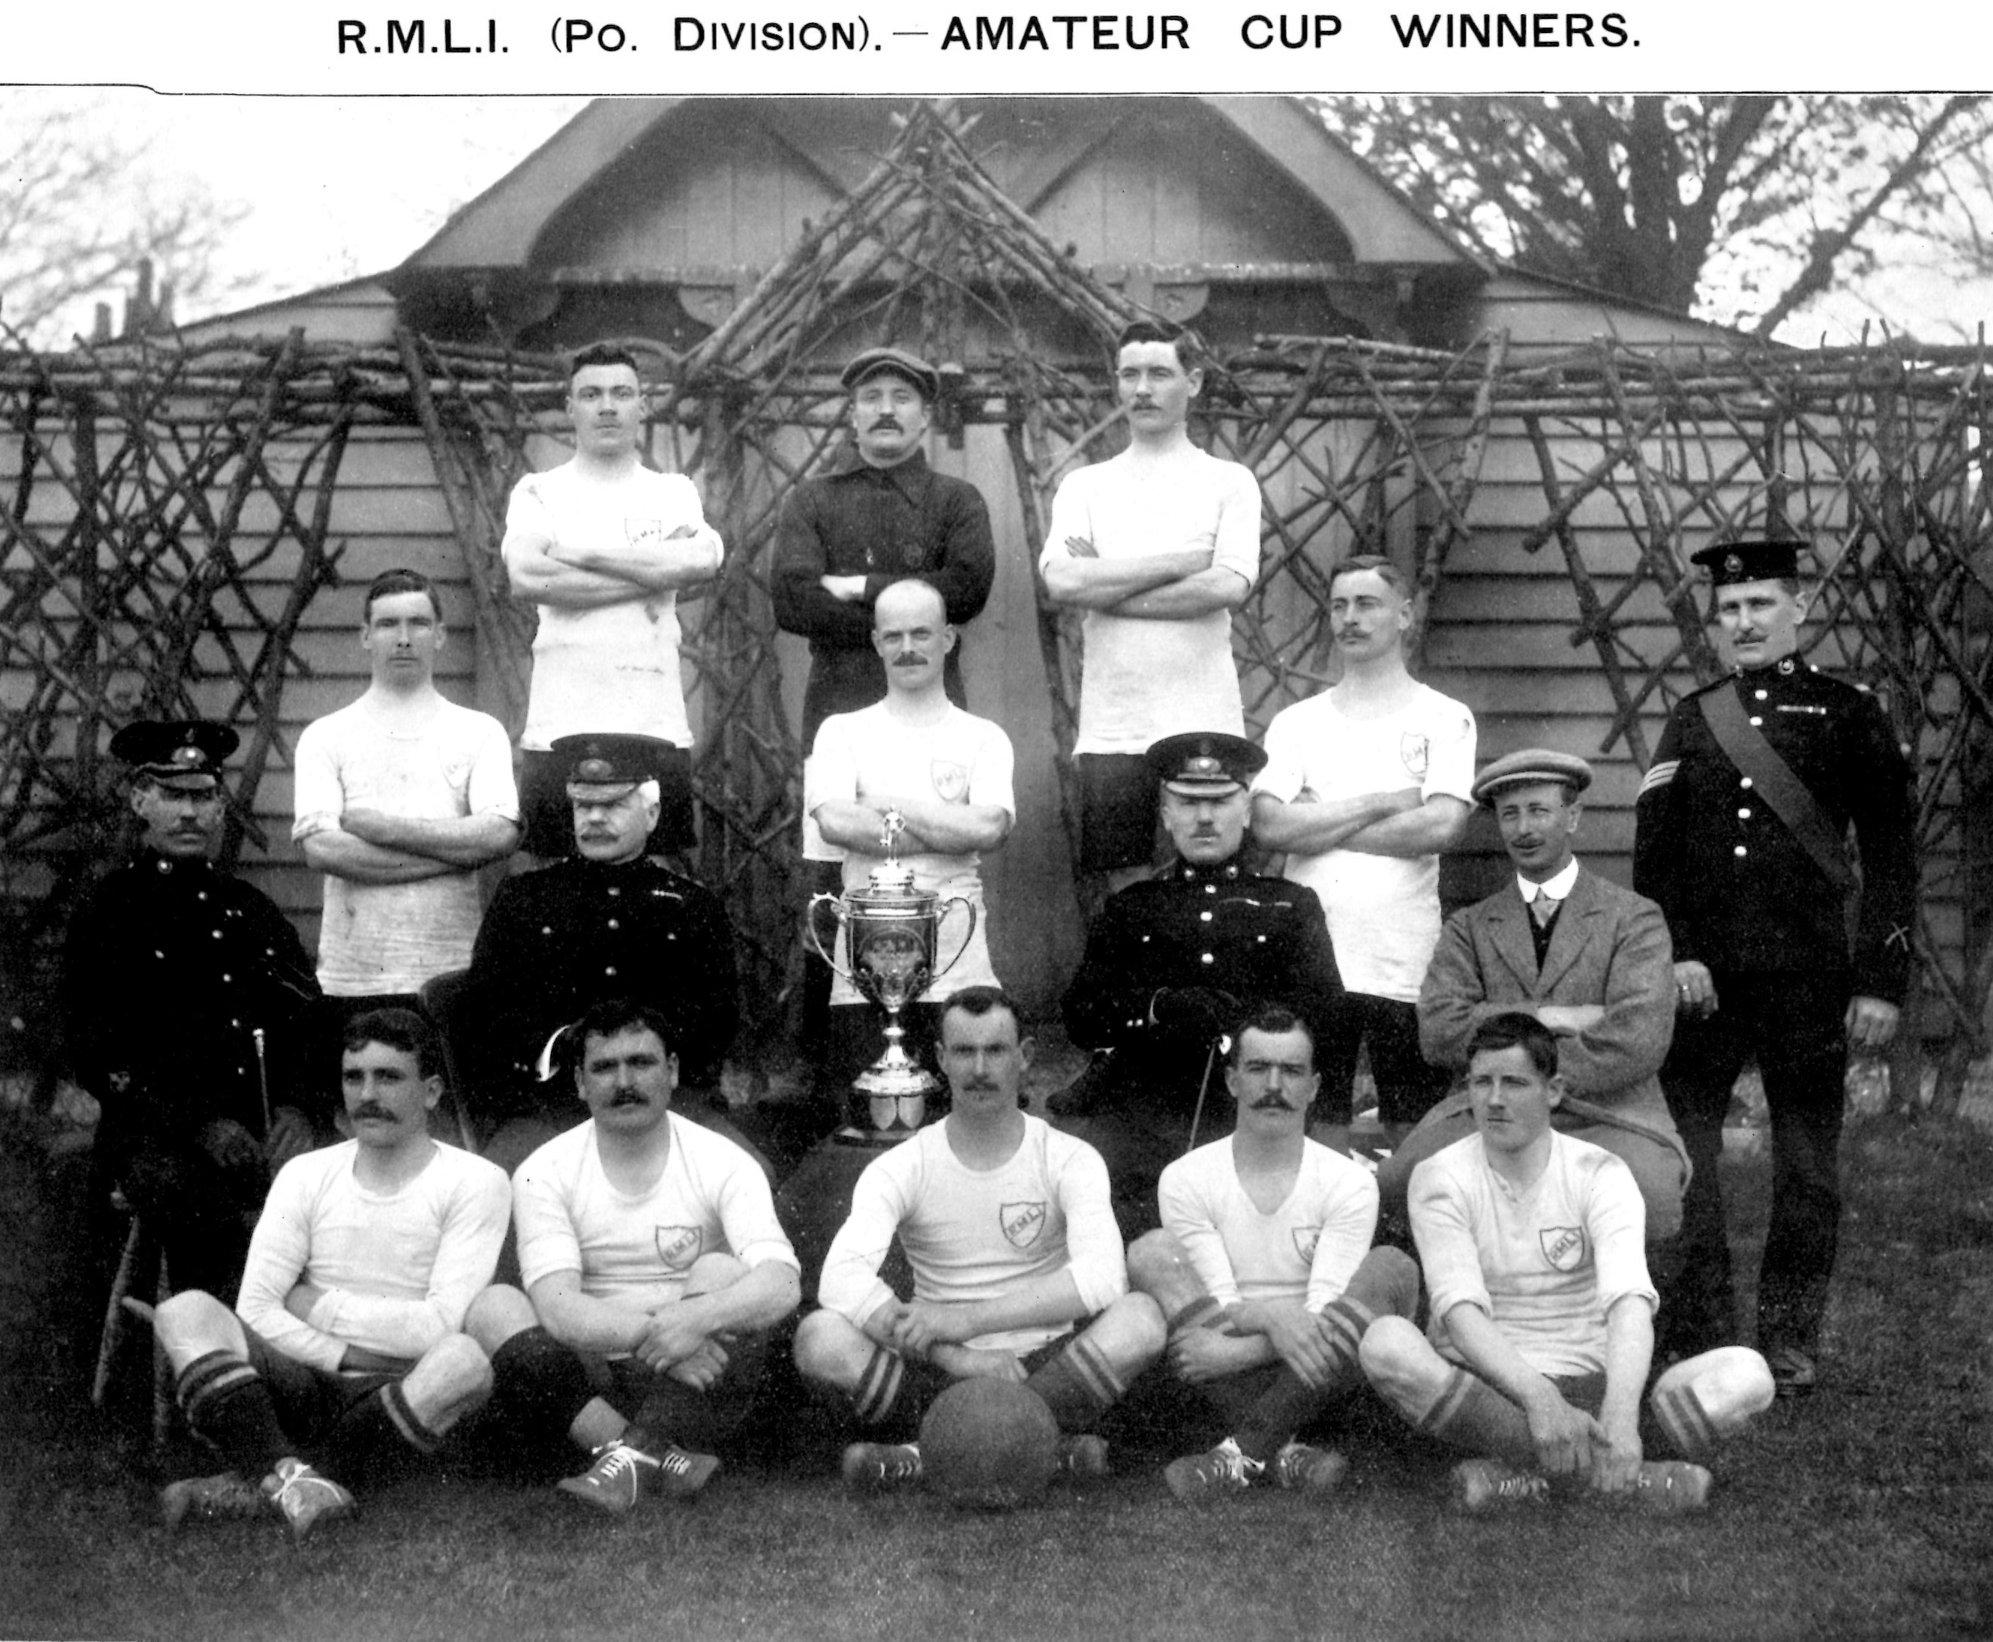 1910 Amateur Cup Winners RMLI